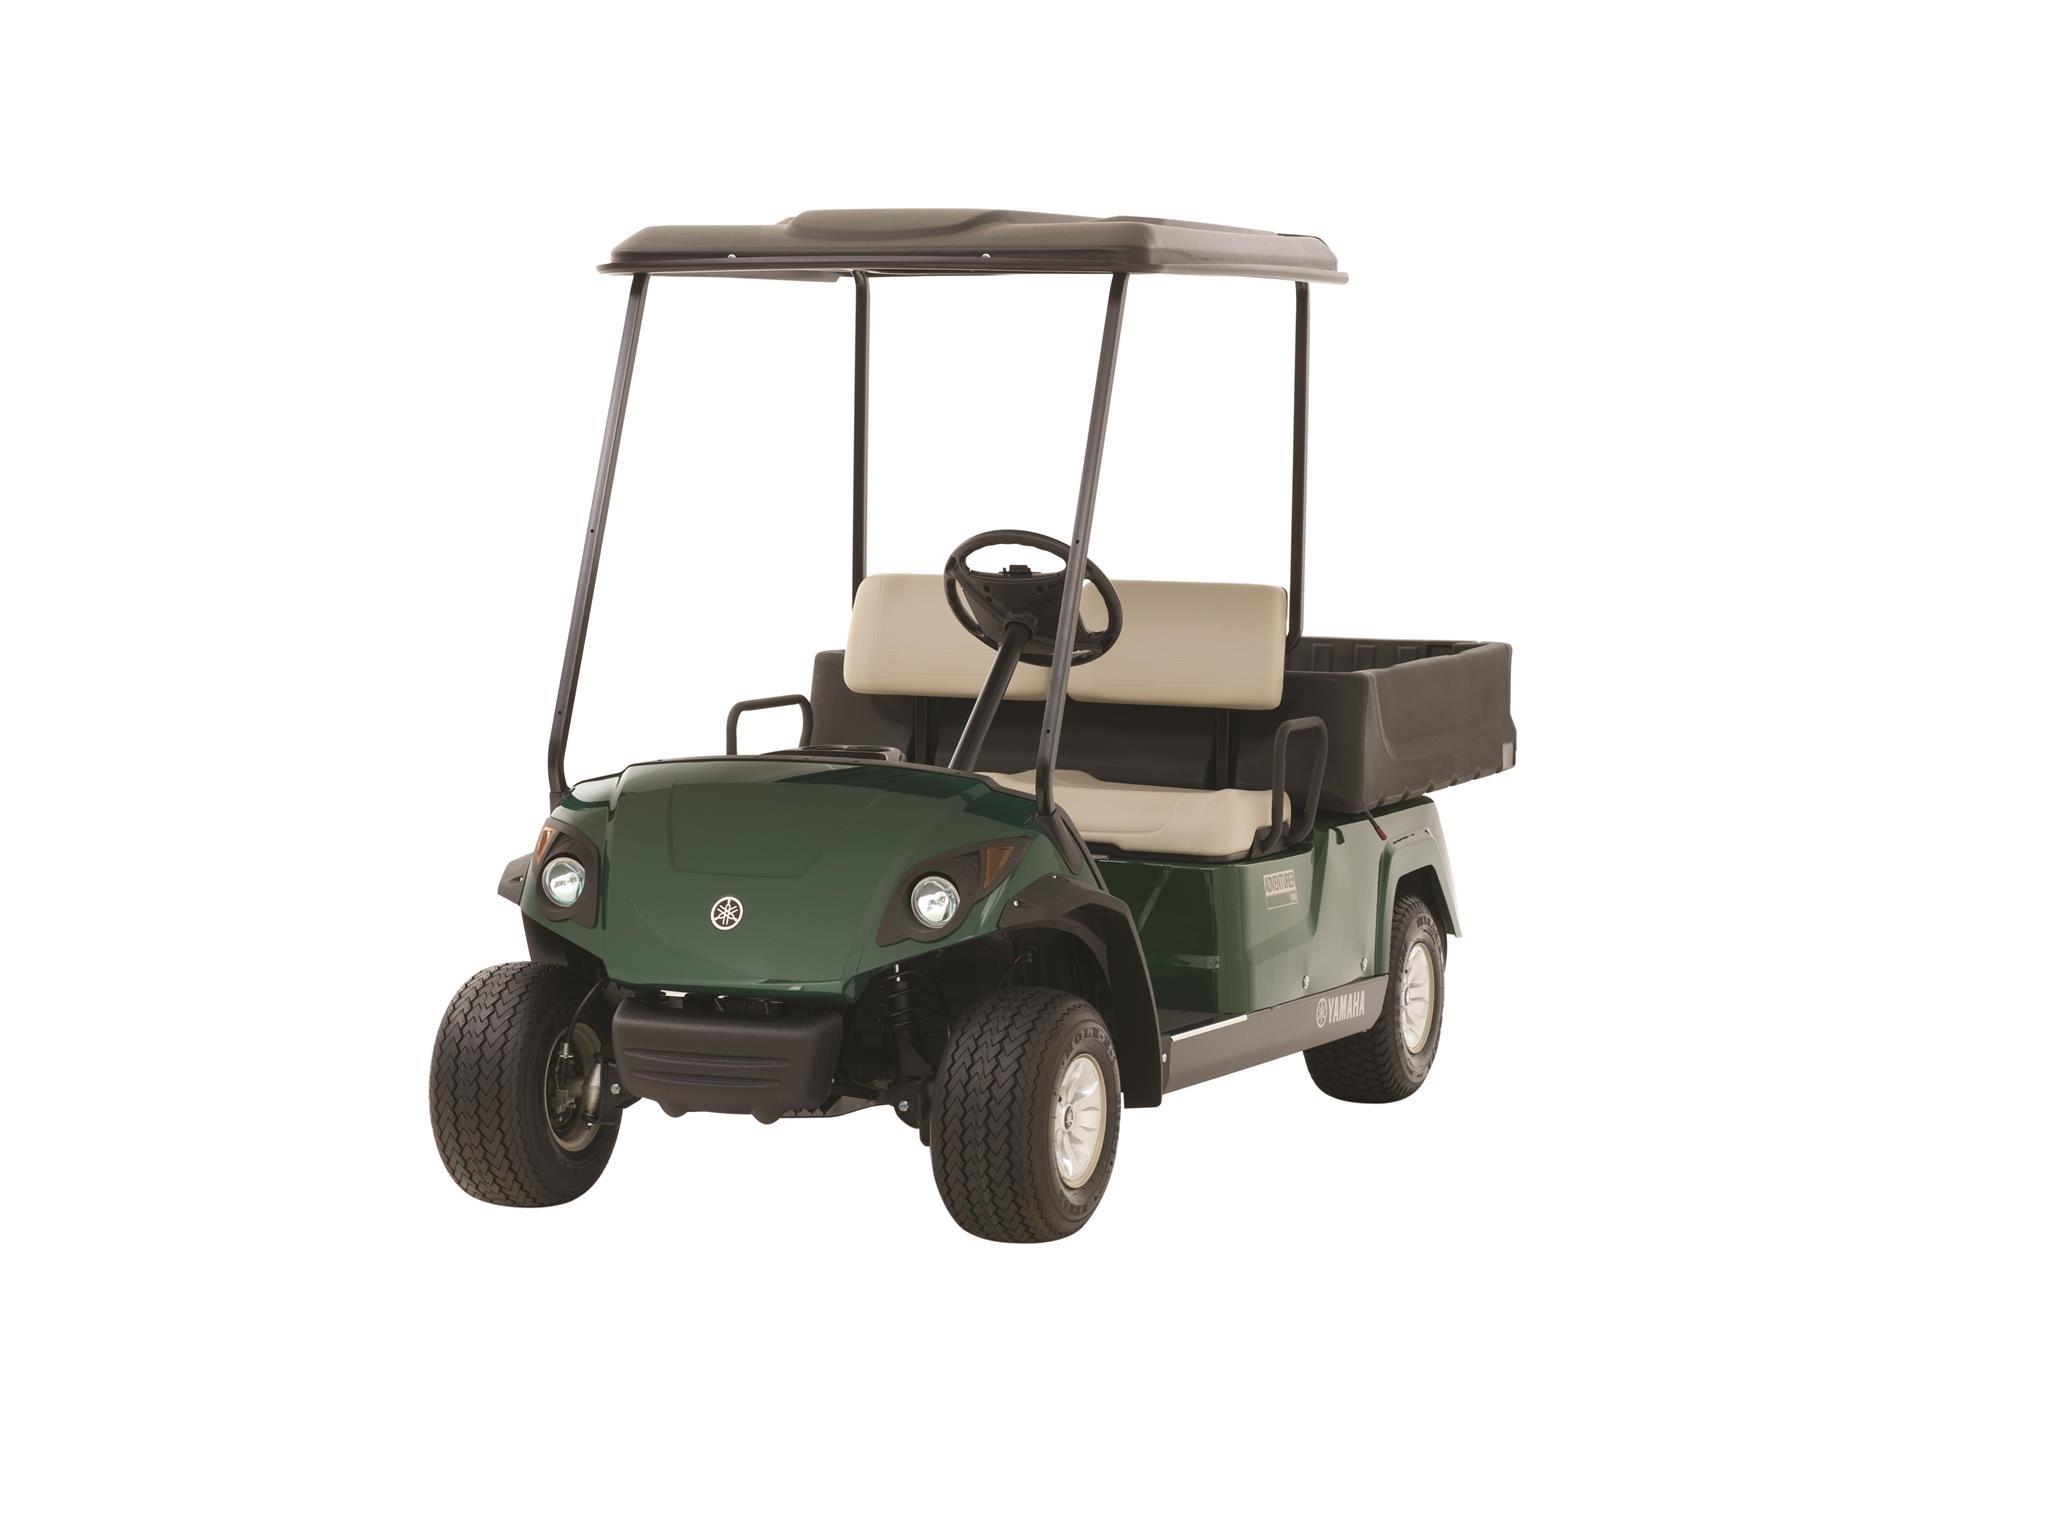 Yamaha golf carts electric golf cars in jacksonville fl for Yamaha dealers in jacksonville fl